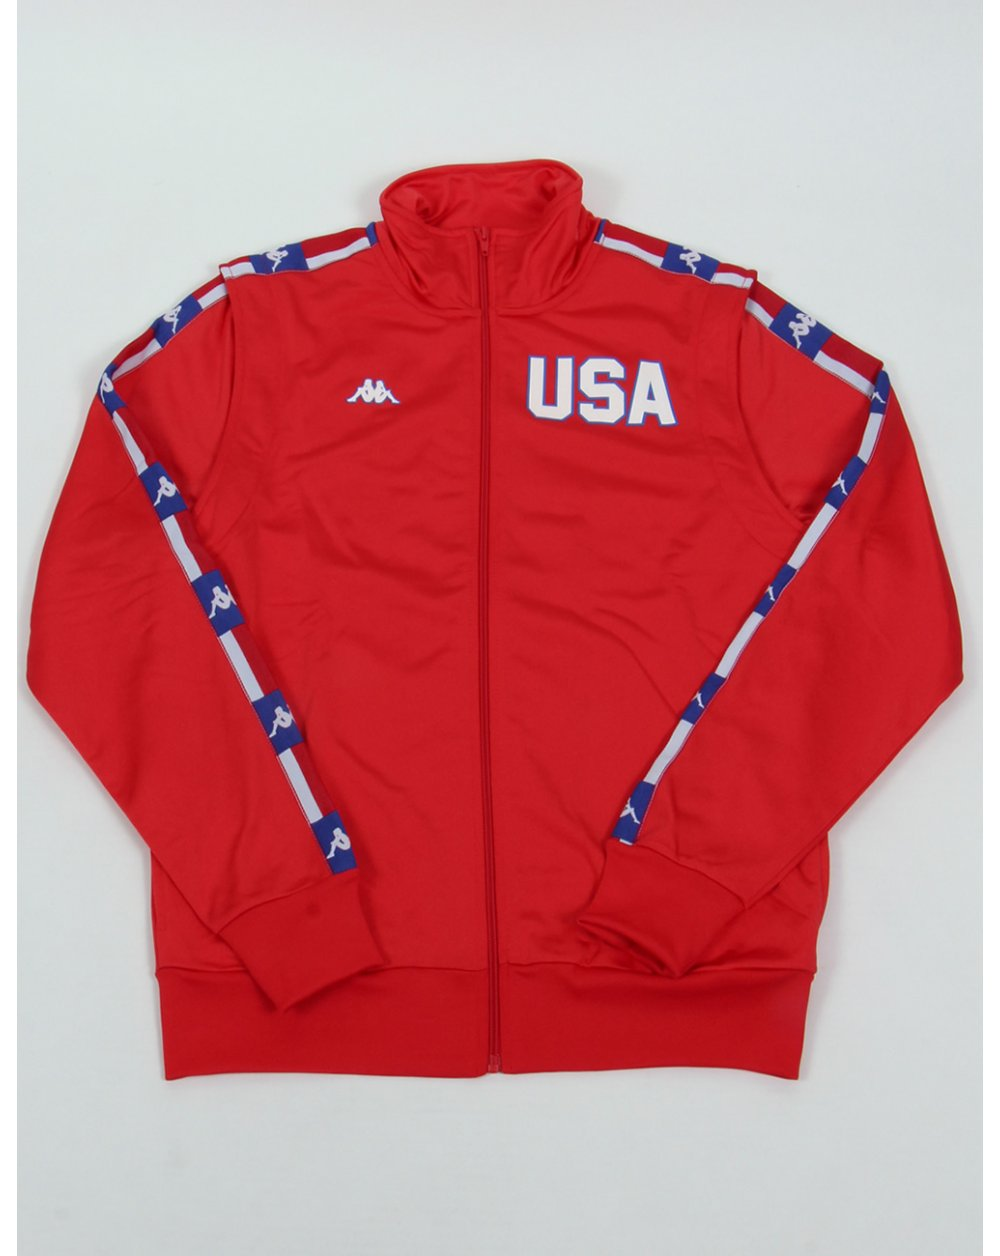 ba0075f186 Robe Di Kappa La84 Usa Olympic Full Tracksuit Red